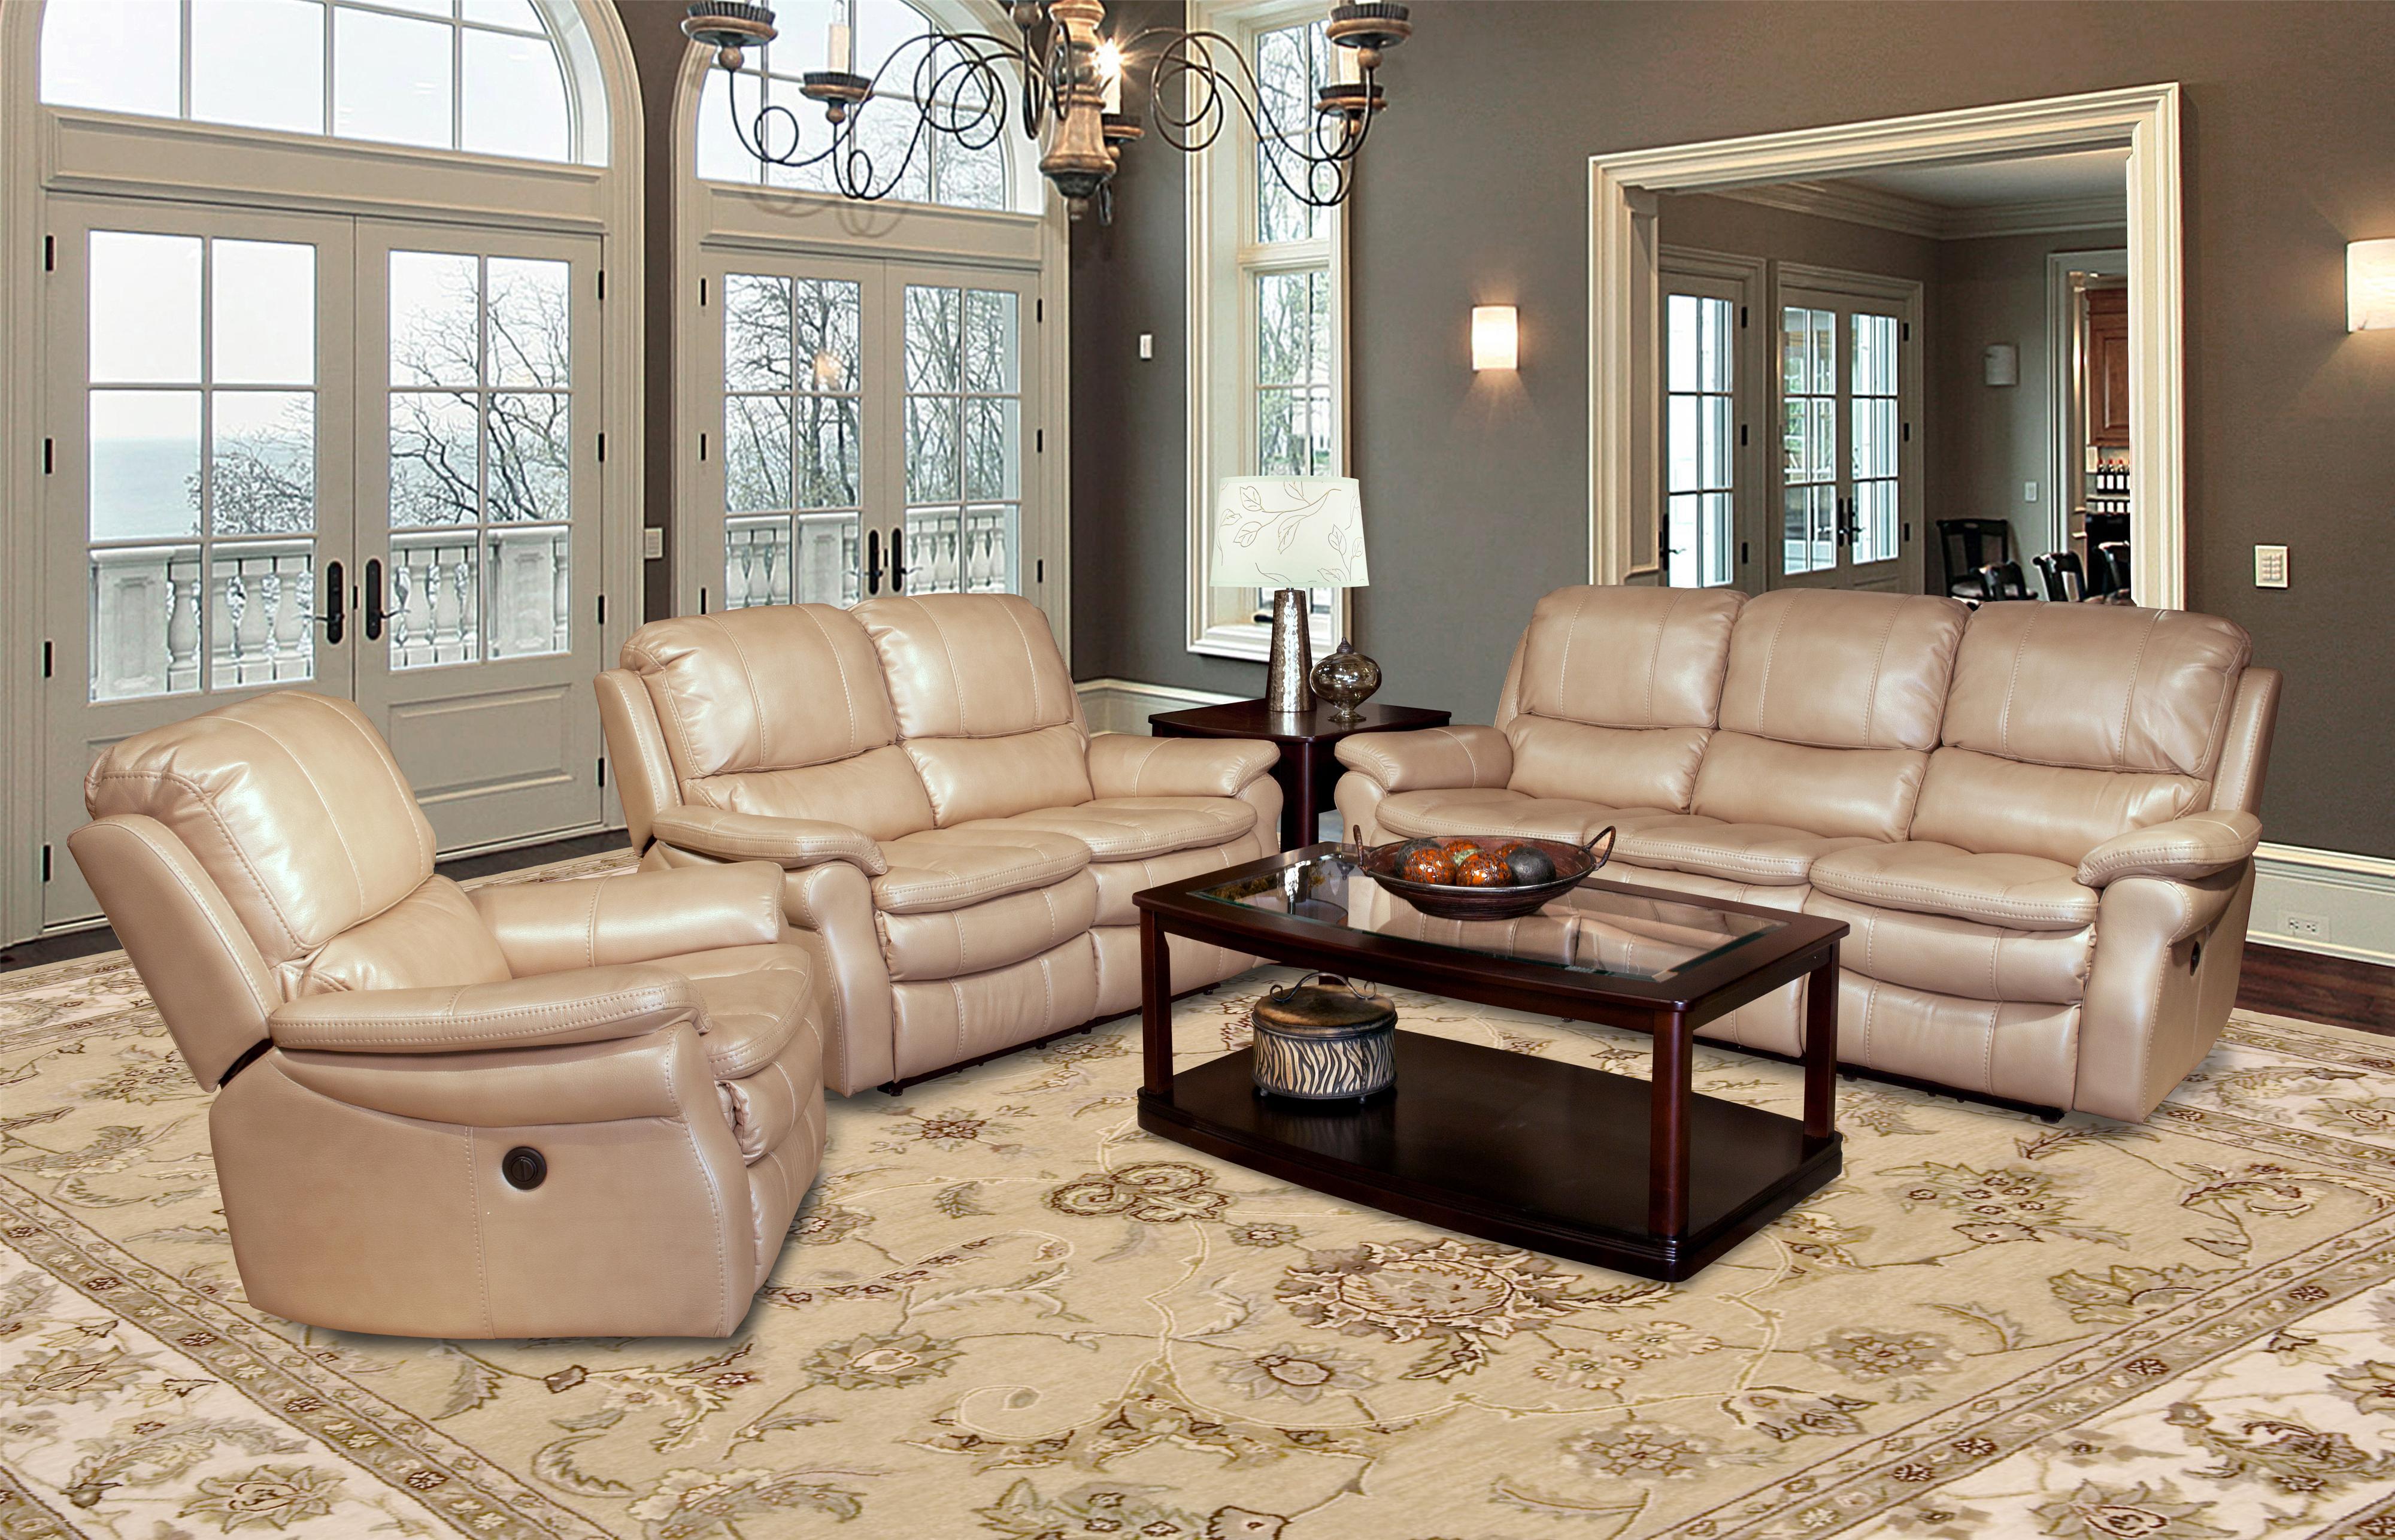 Parker Living Juno Reclining Living Room Group - Item Number: MJUN Living Room Group 2